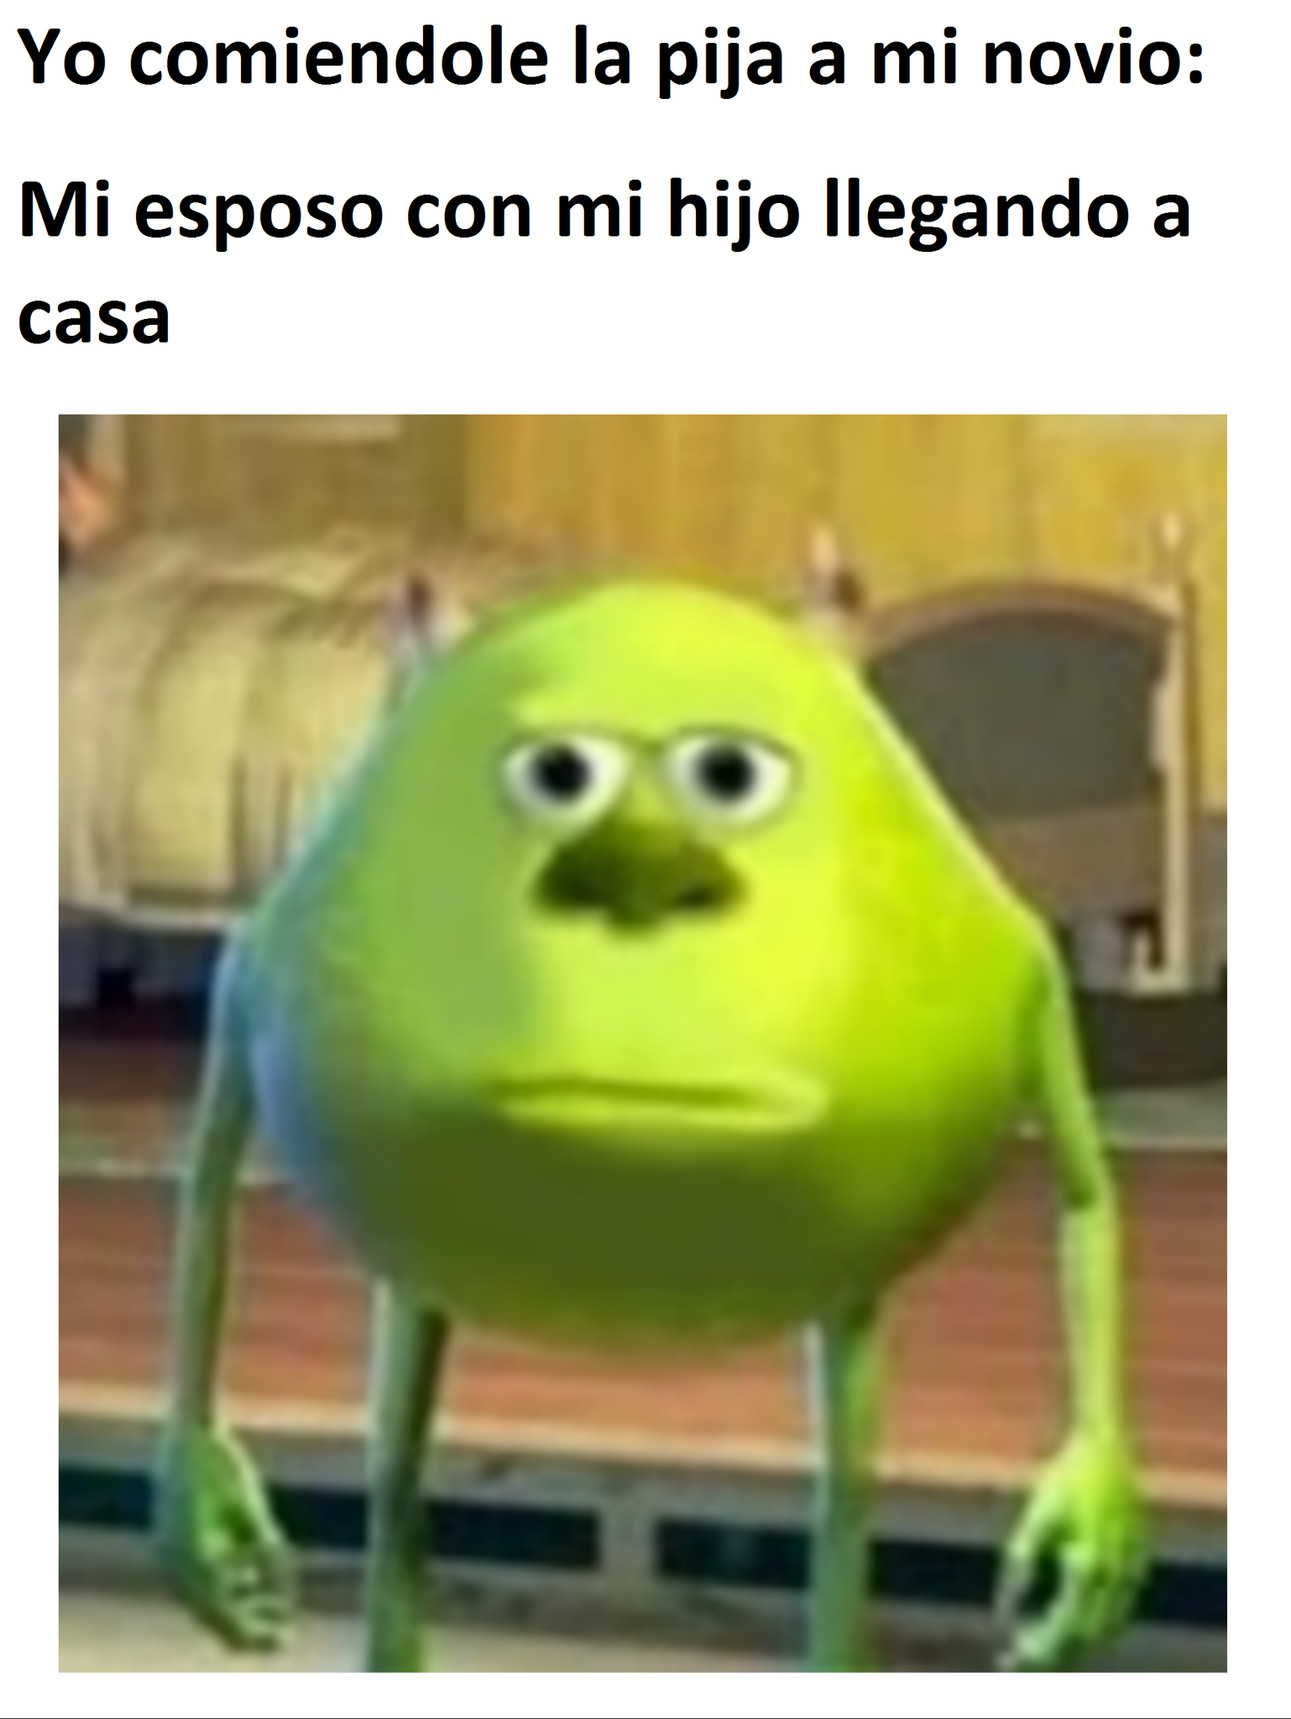 Wazowski memes en español